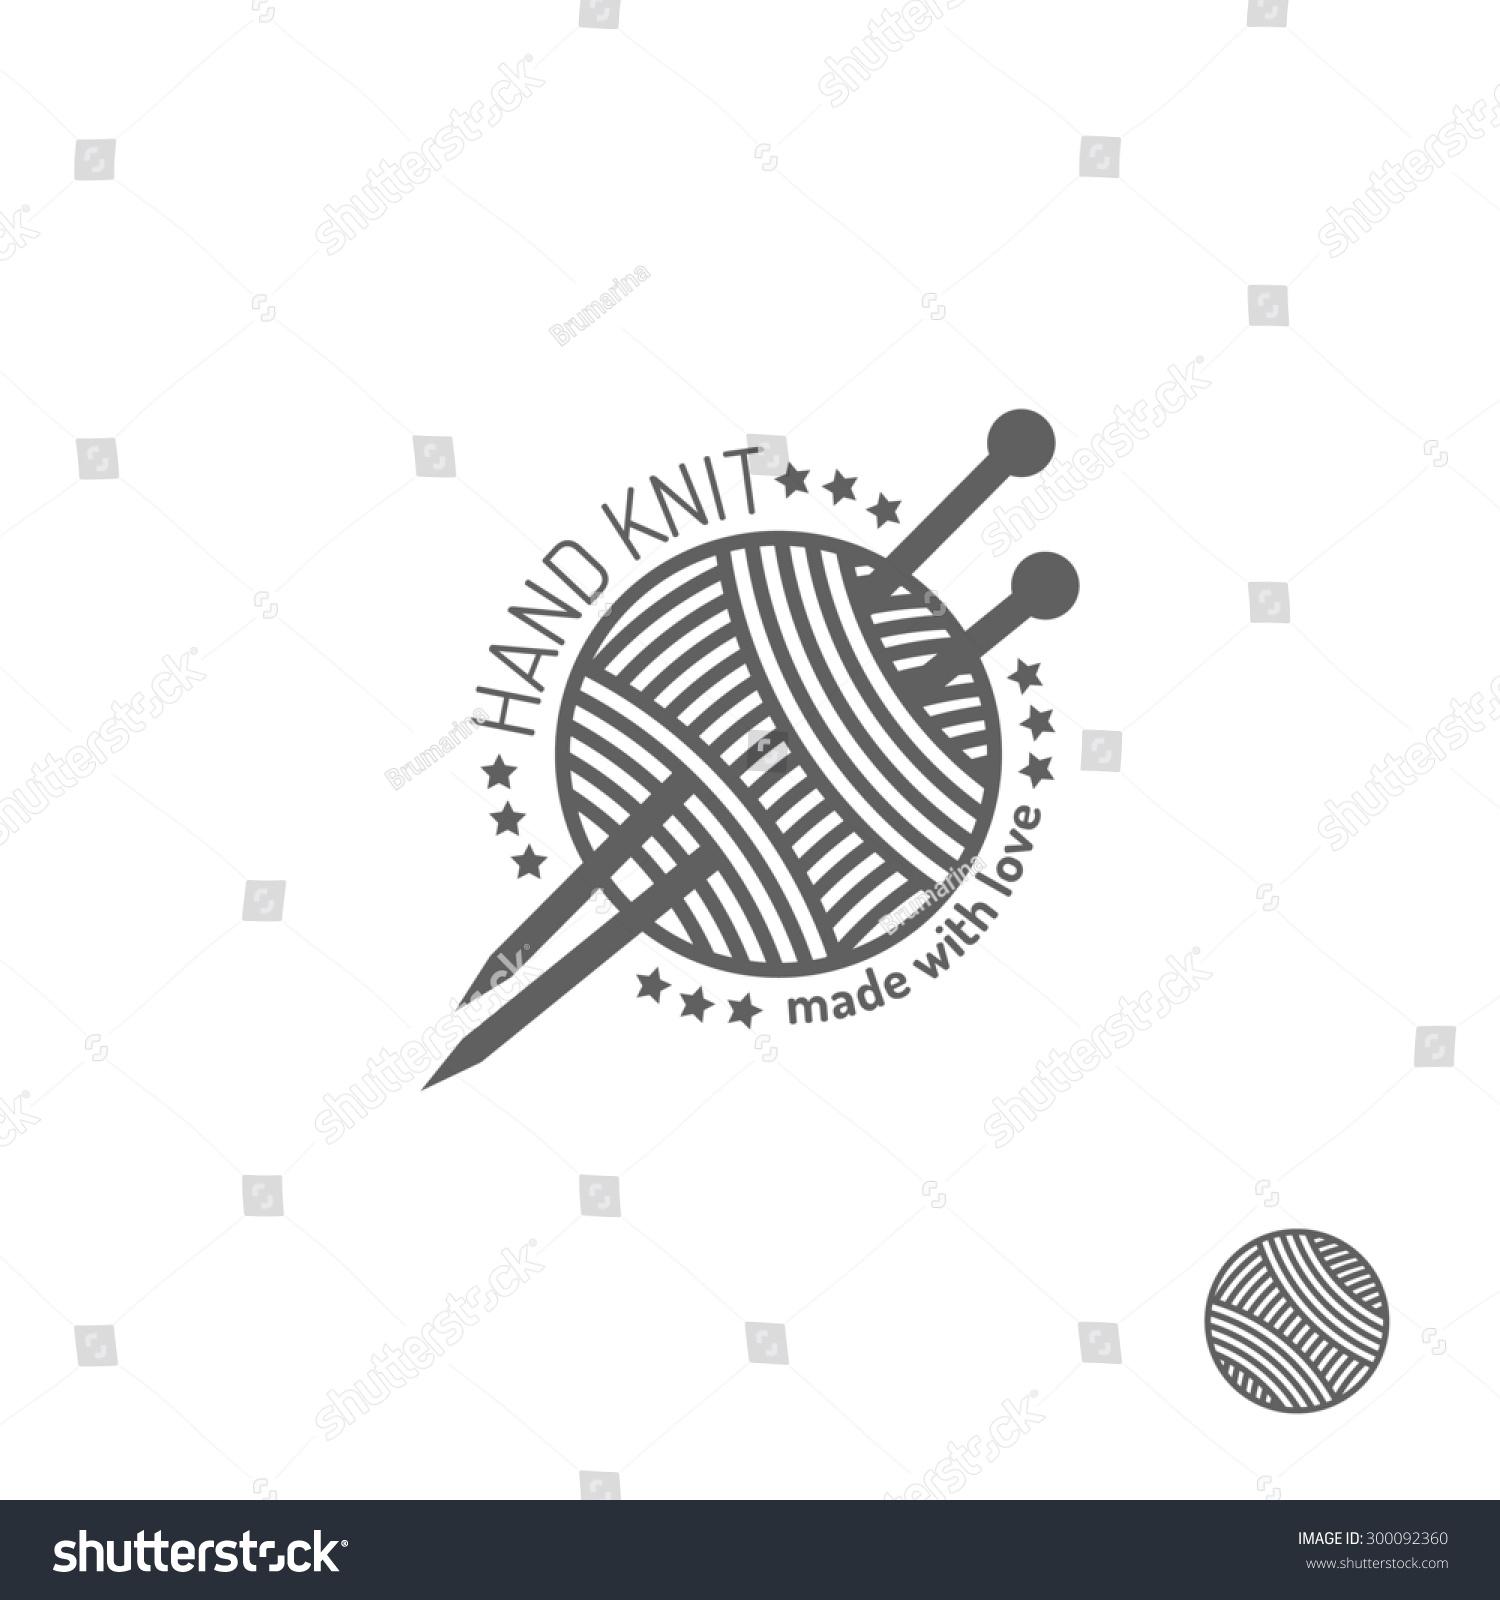 Knitting Club Logo : Hand knit label badge or logo design elements stock